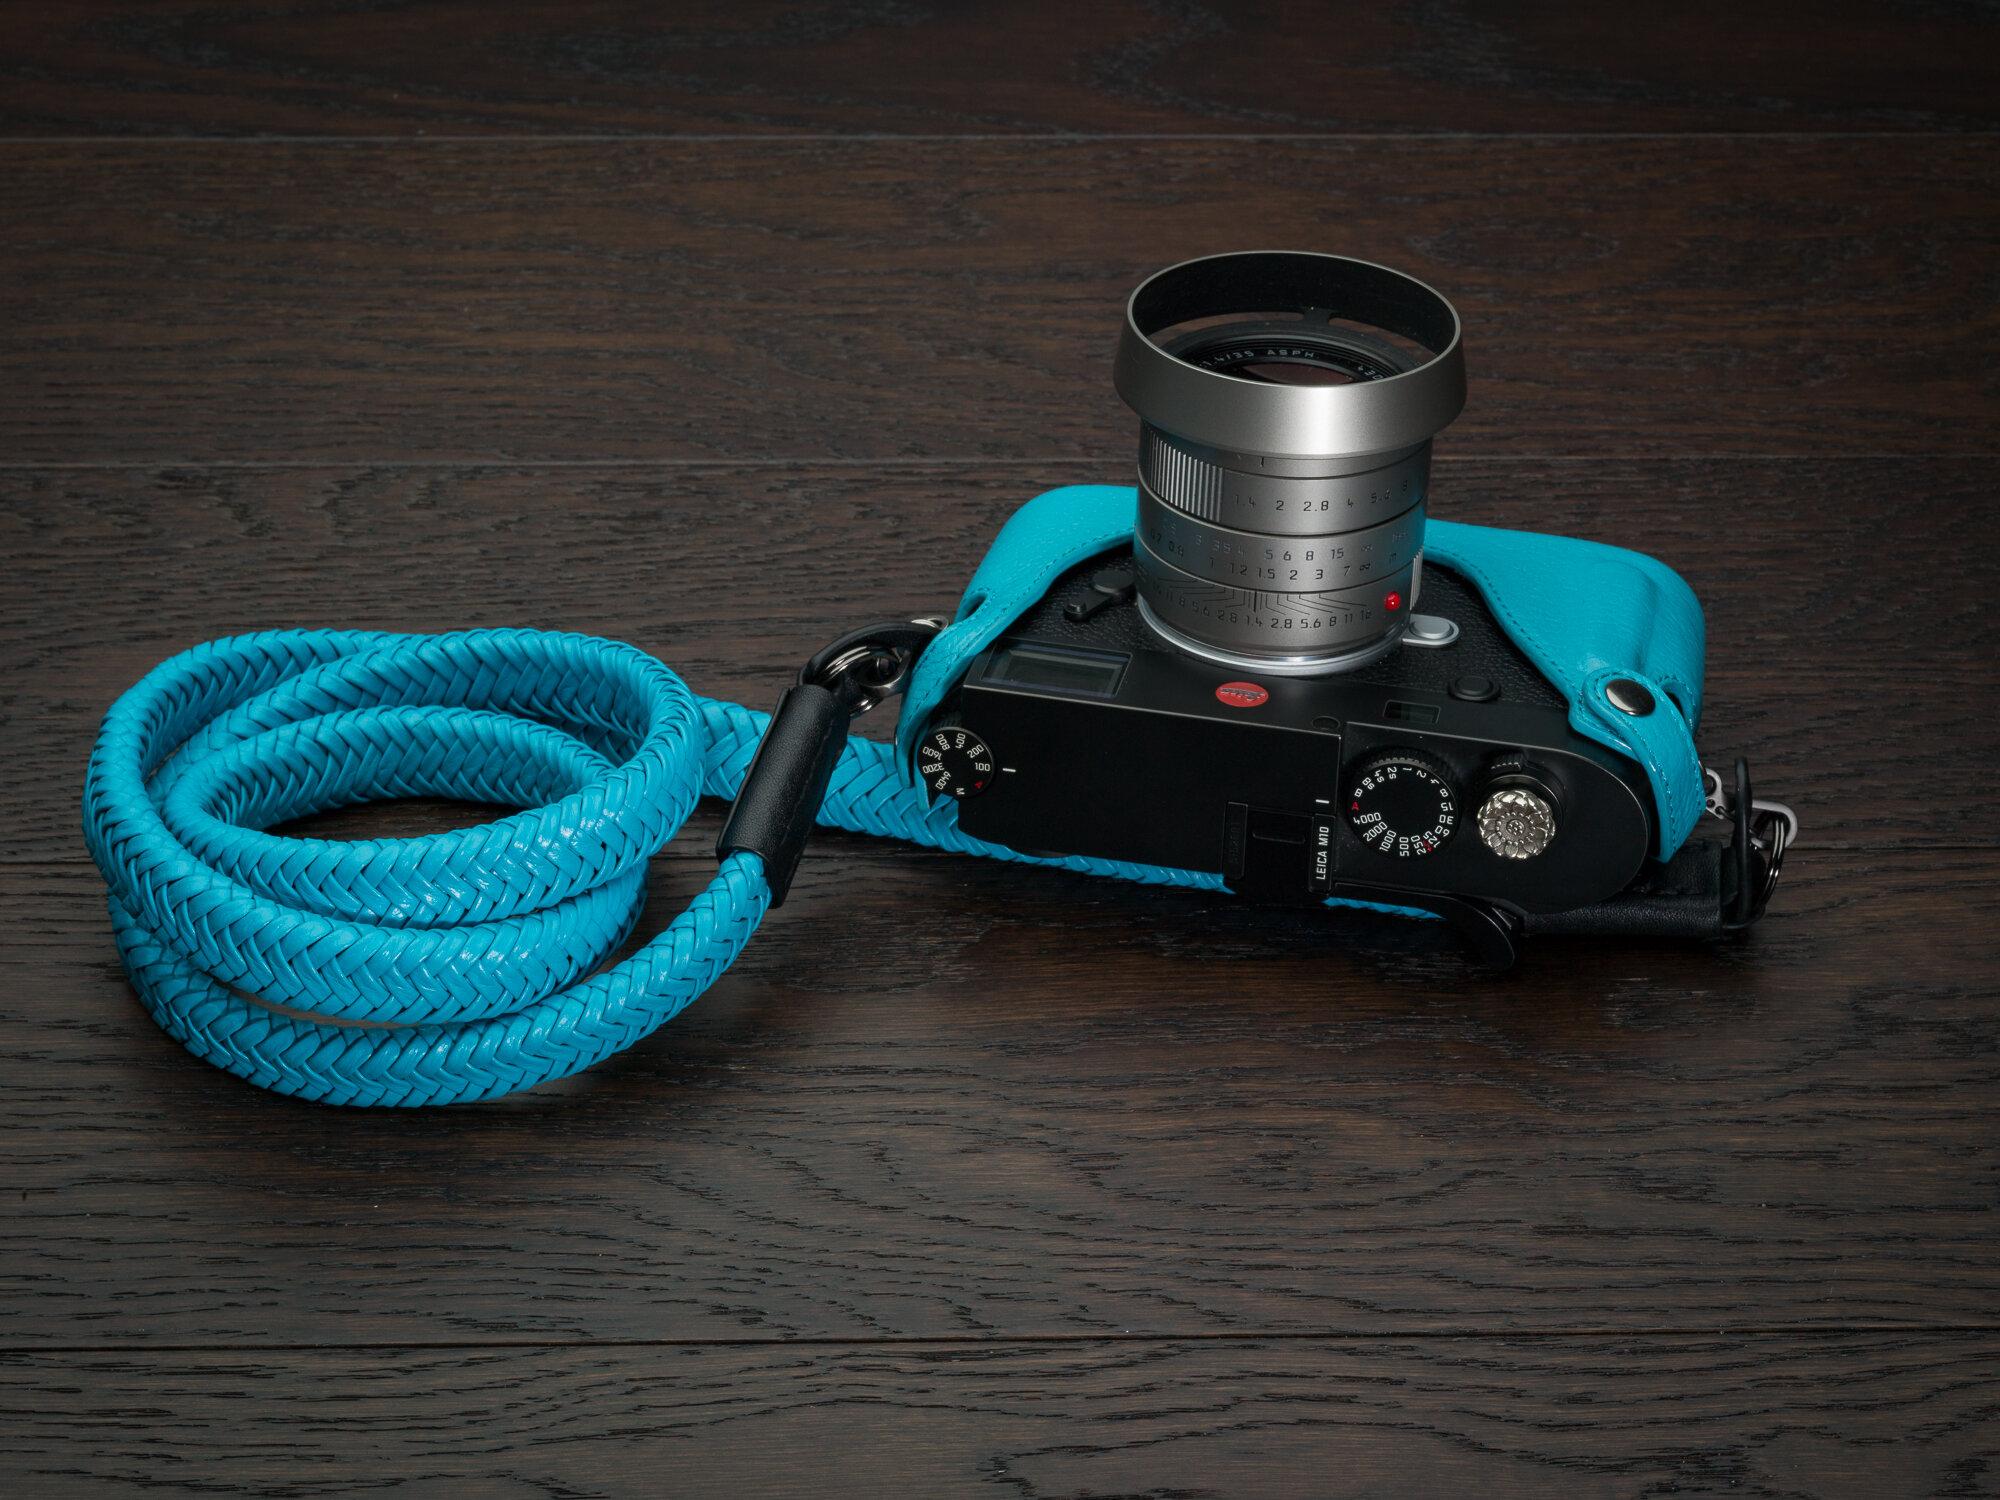 VV Matador miami blue leather camera strap leica m10.jpg